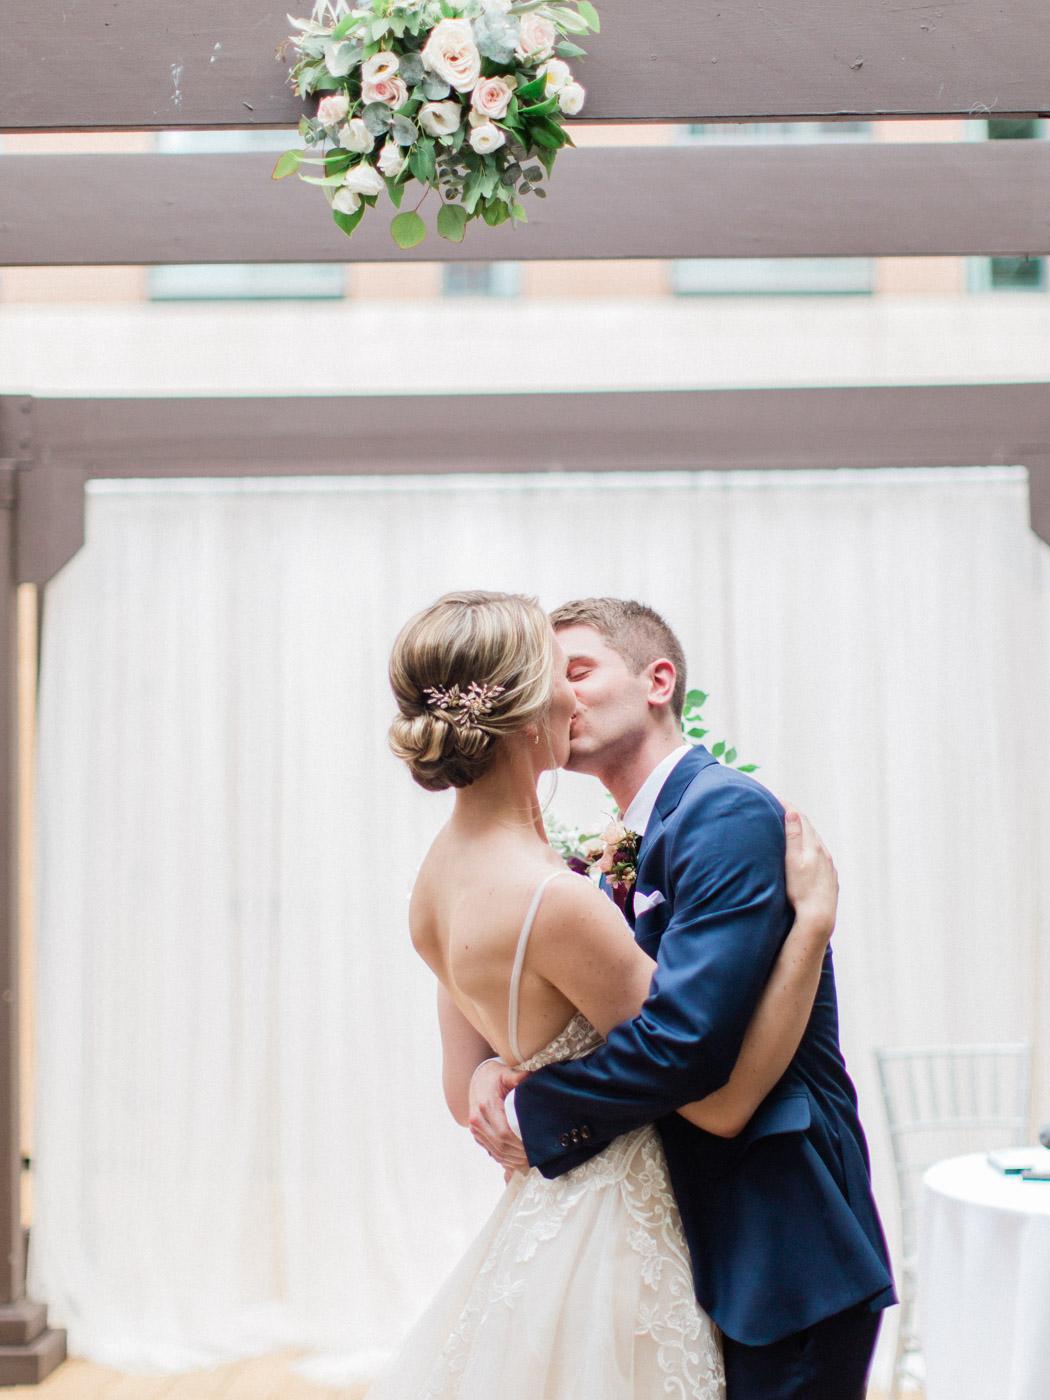 downtown-toronto-wedding-photographer-berkley-fieldhouse-blush-356.jpg